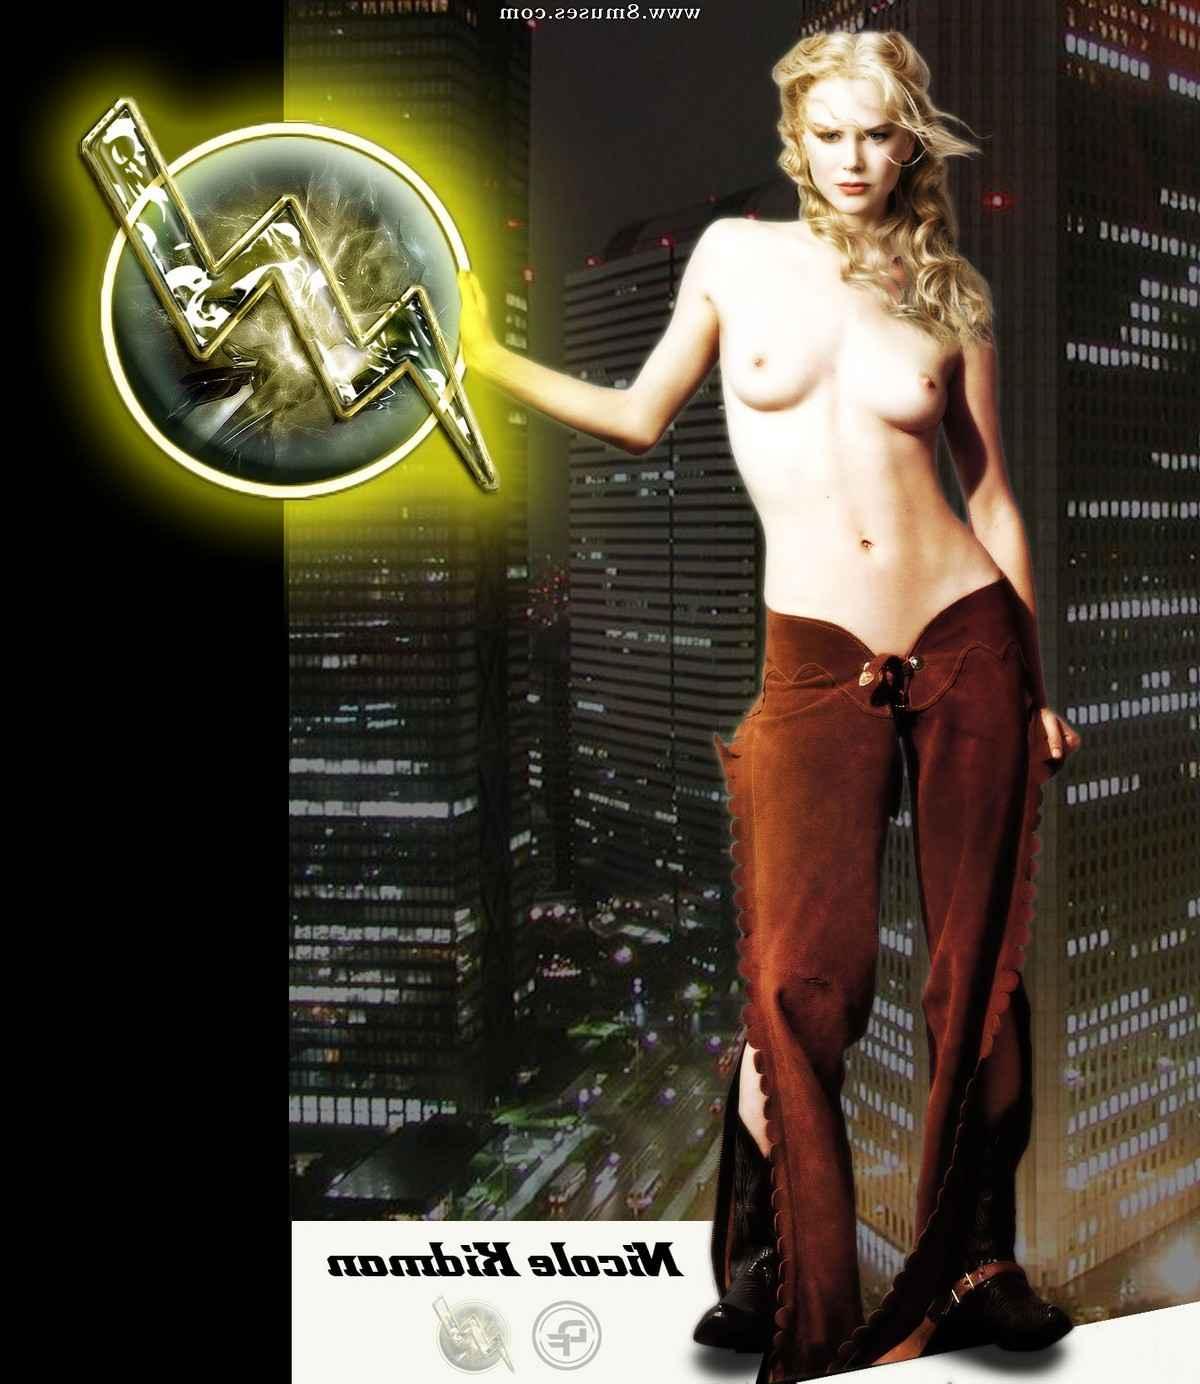 Fake-Celebrities-Sex-Pictures/Nicole-Kidman Nicole_Kidman__8muses_-_Sex_and_Porn_Comics_649.jpg